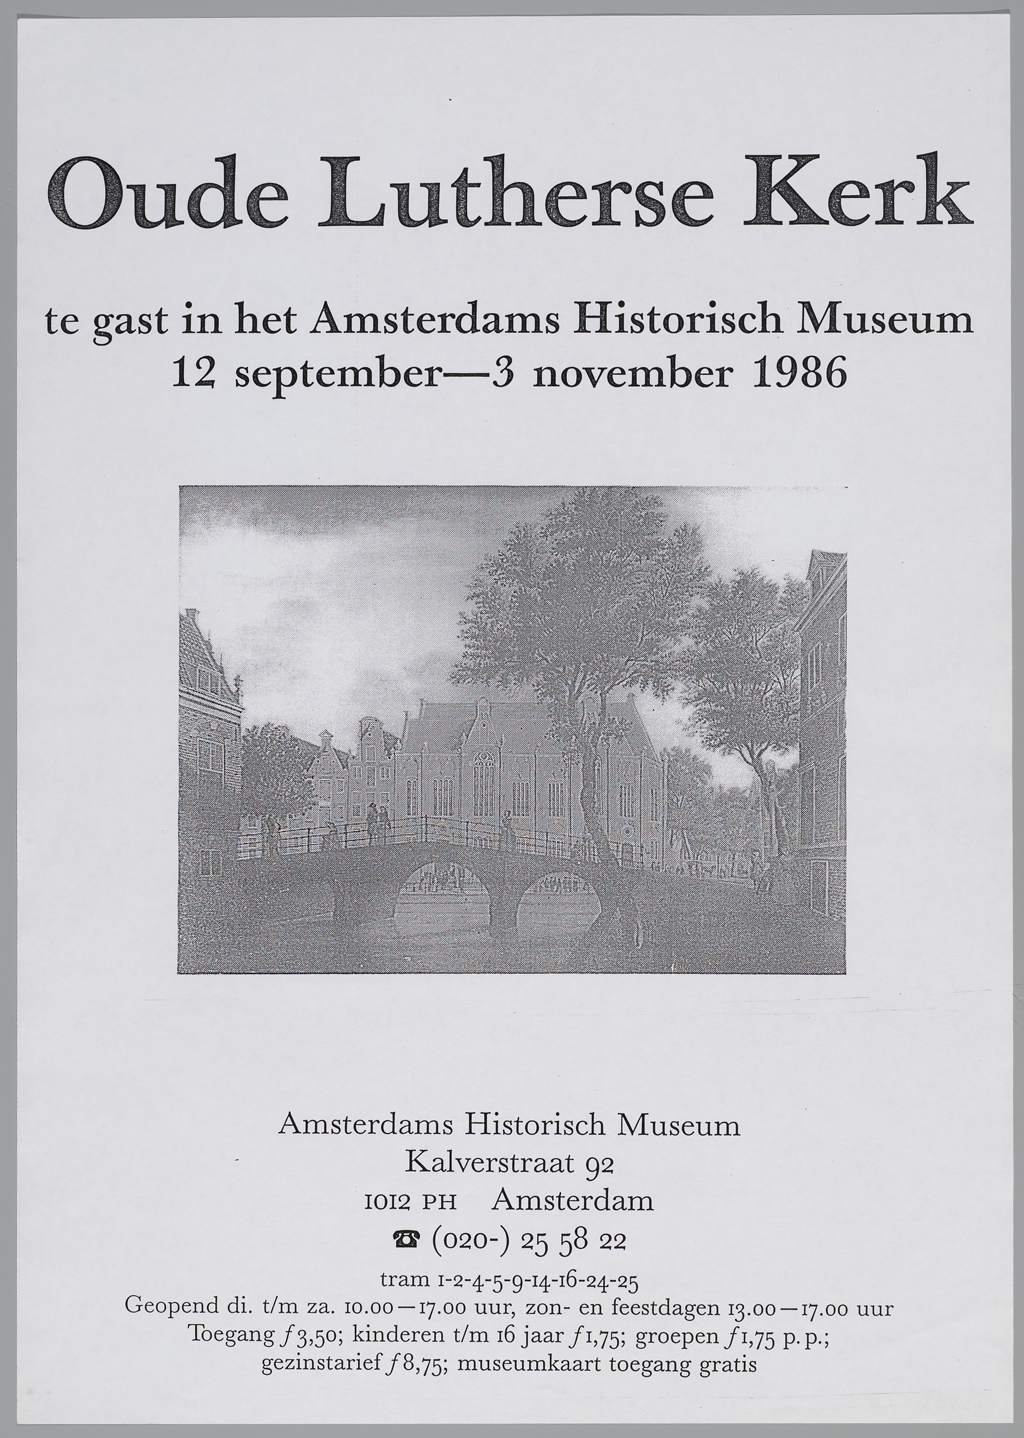 1986, affiche voor tentoonstelling Oude Lutherse Kerk